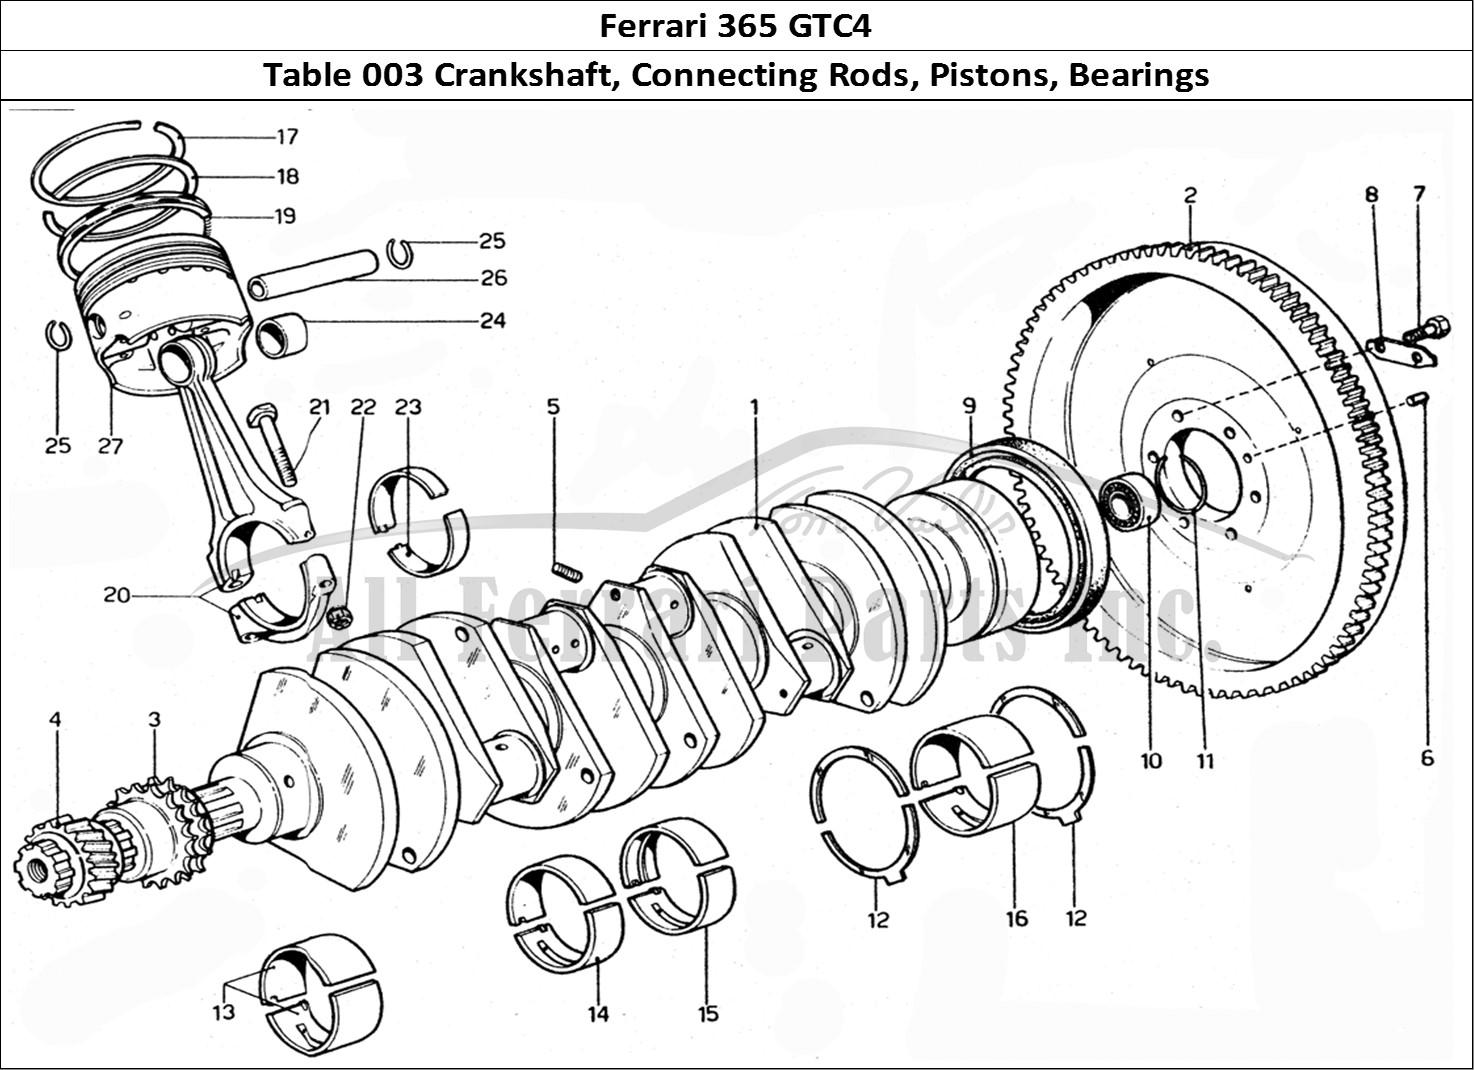 Buy Original Ferrari 365 Gtc4 003 Crankshaft Connecting